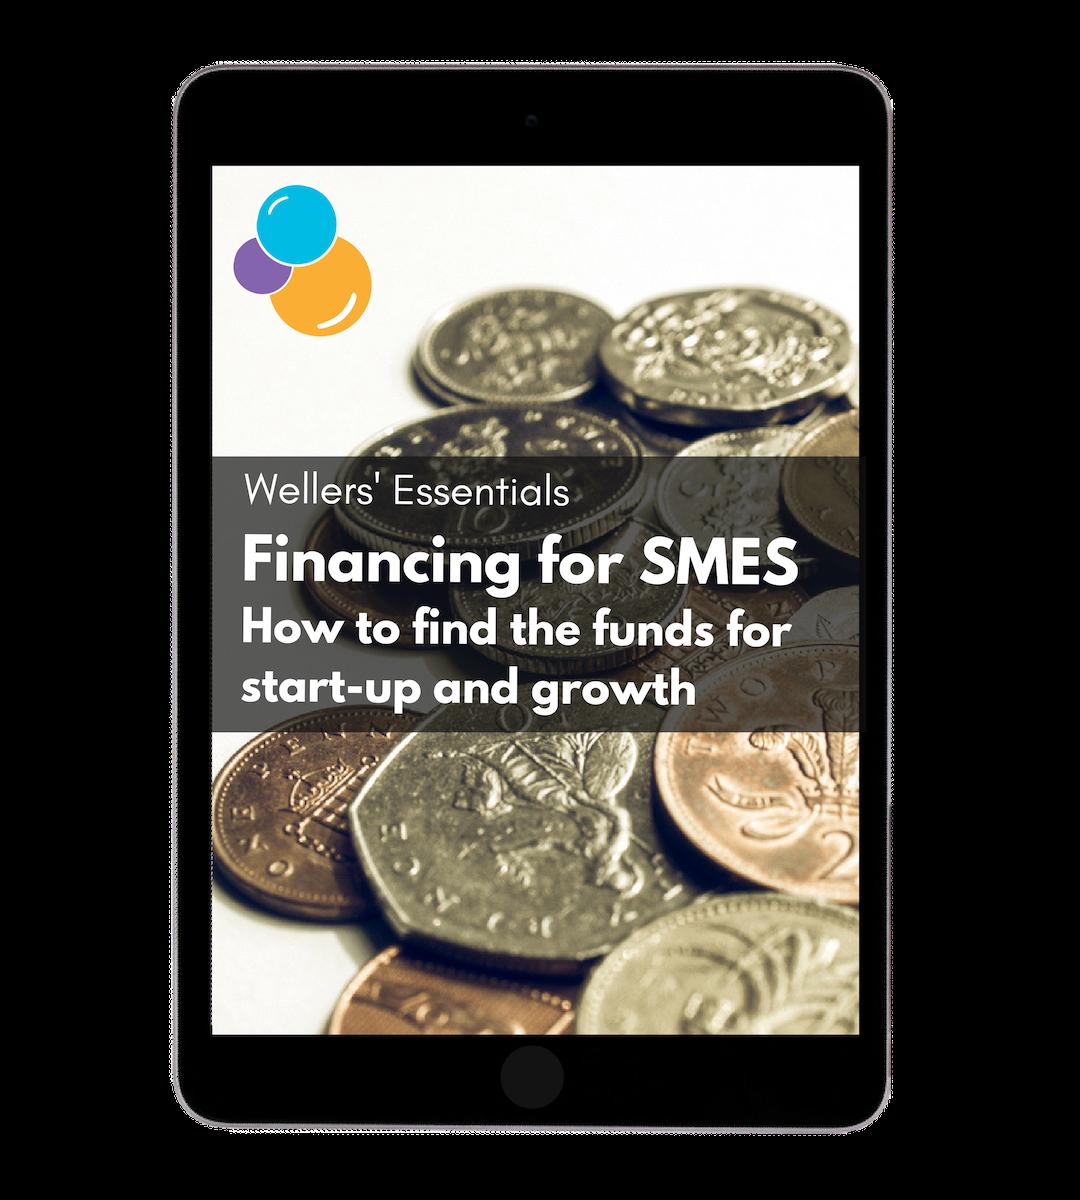 wellers-business-funding-growing